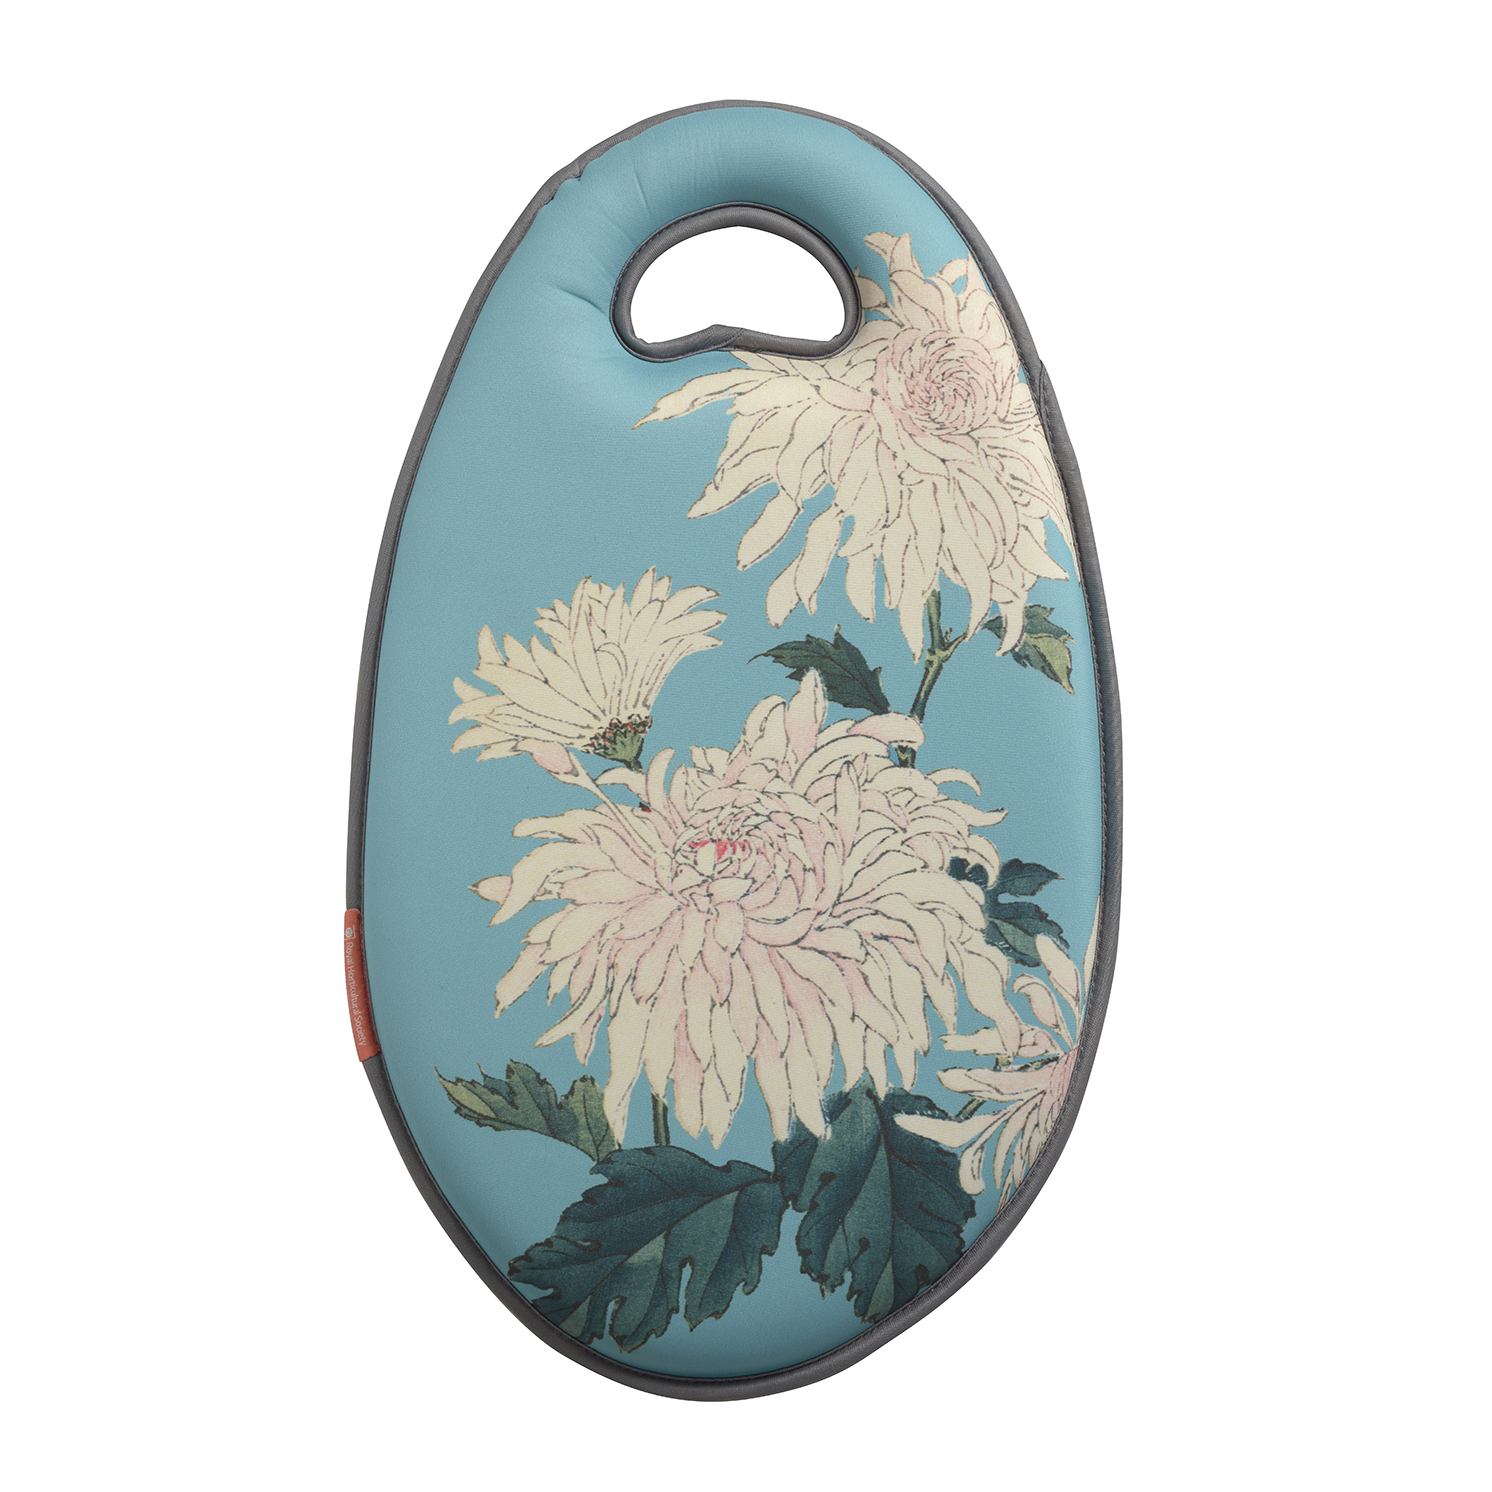 Burgon & Ball – RHS Chrysanthemum Kneelo® Kneeler